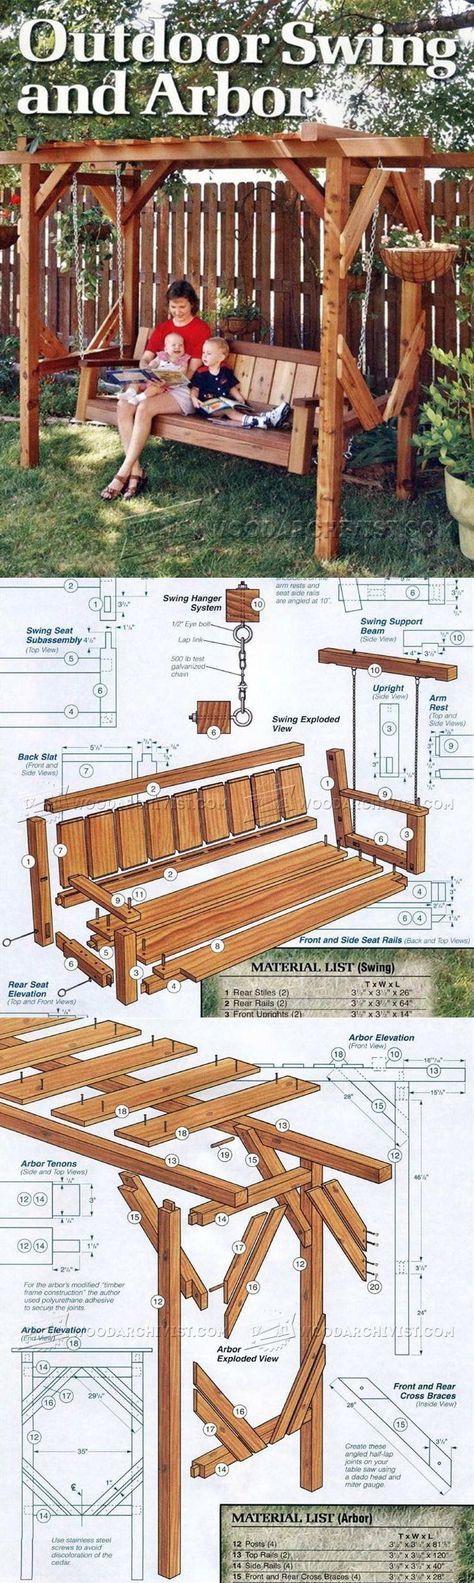 Best 25+ Outdoor furniture plans ideas on Pinterest   Woodworking ...